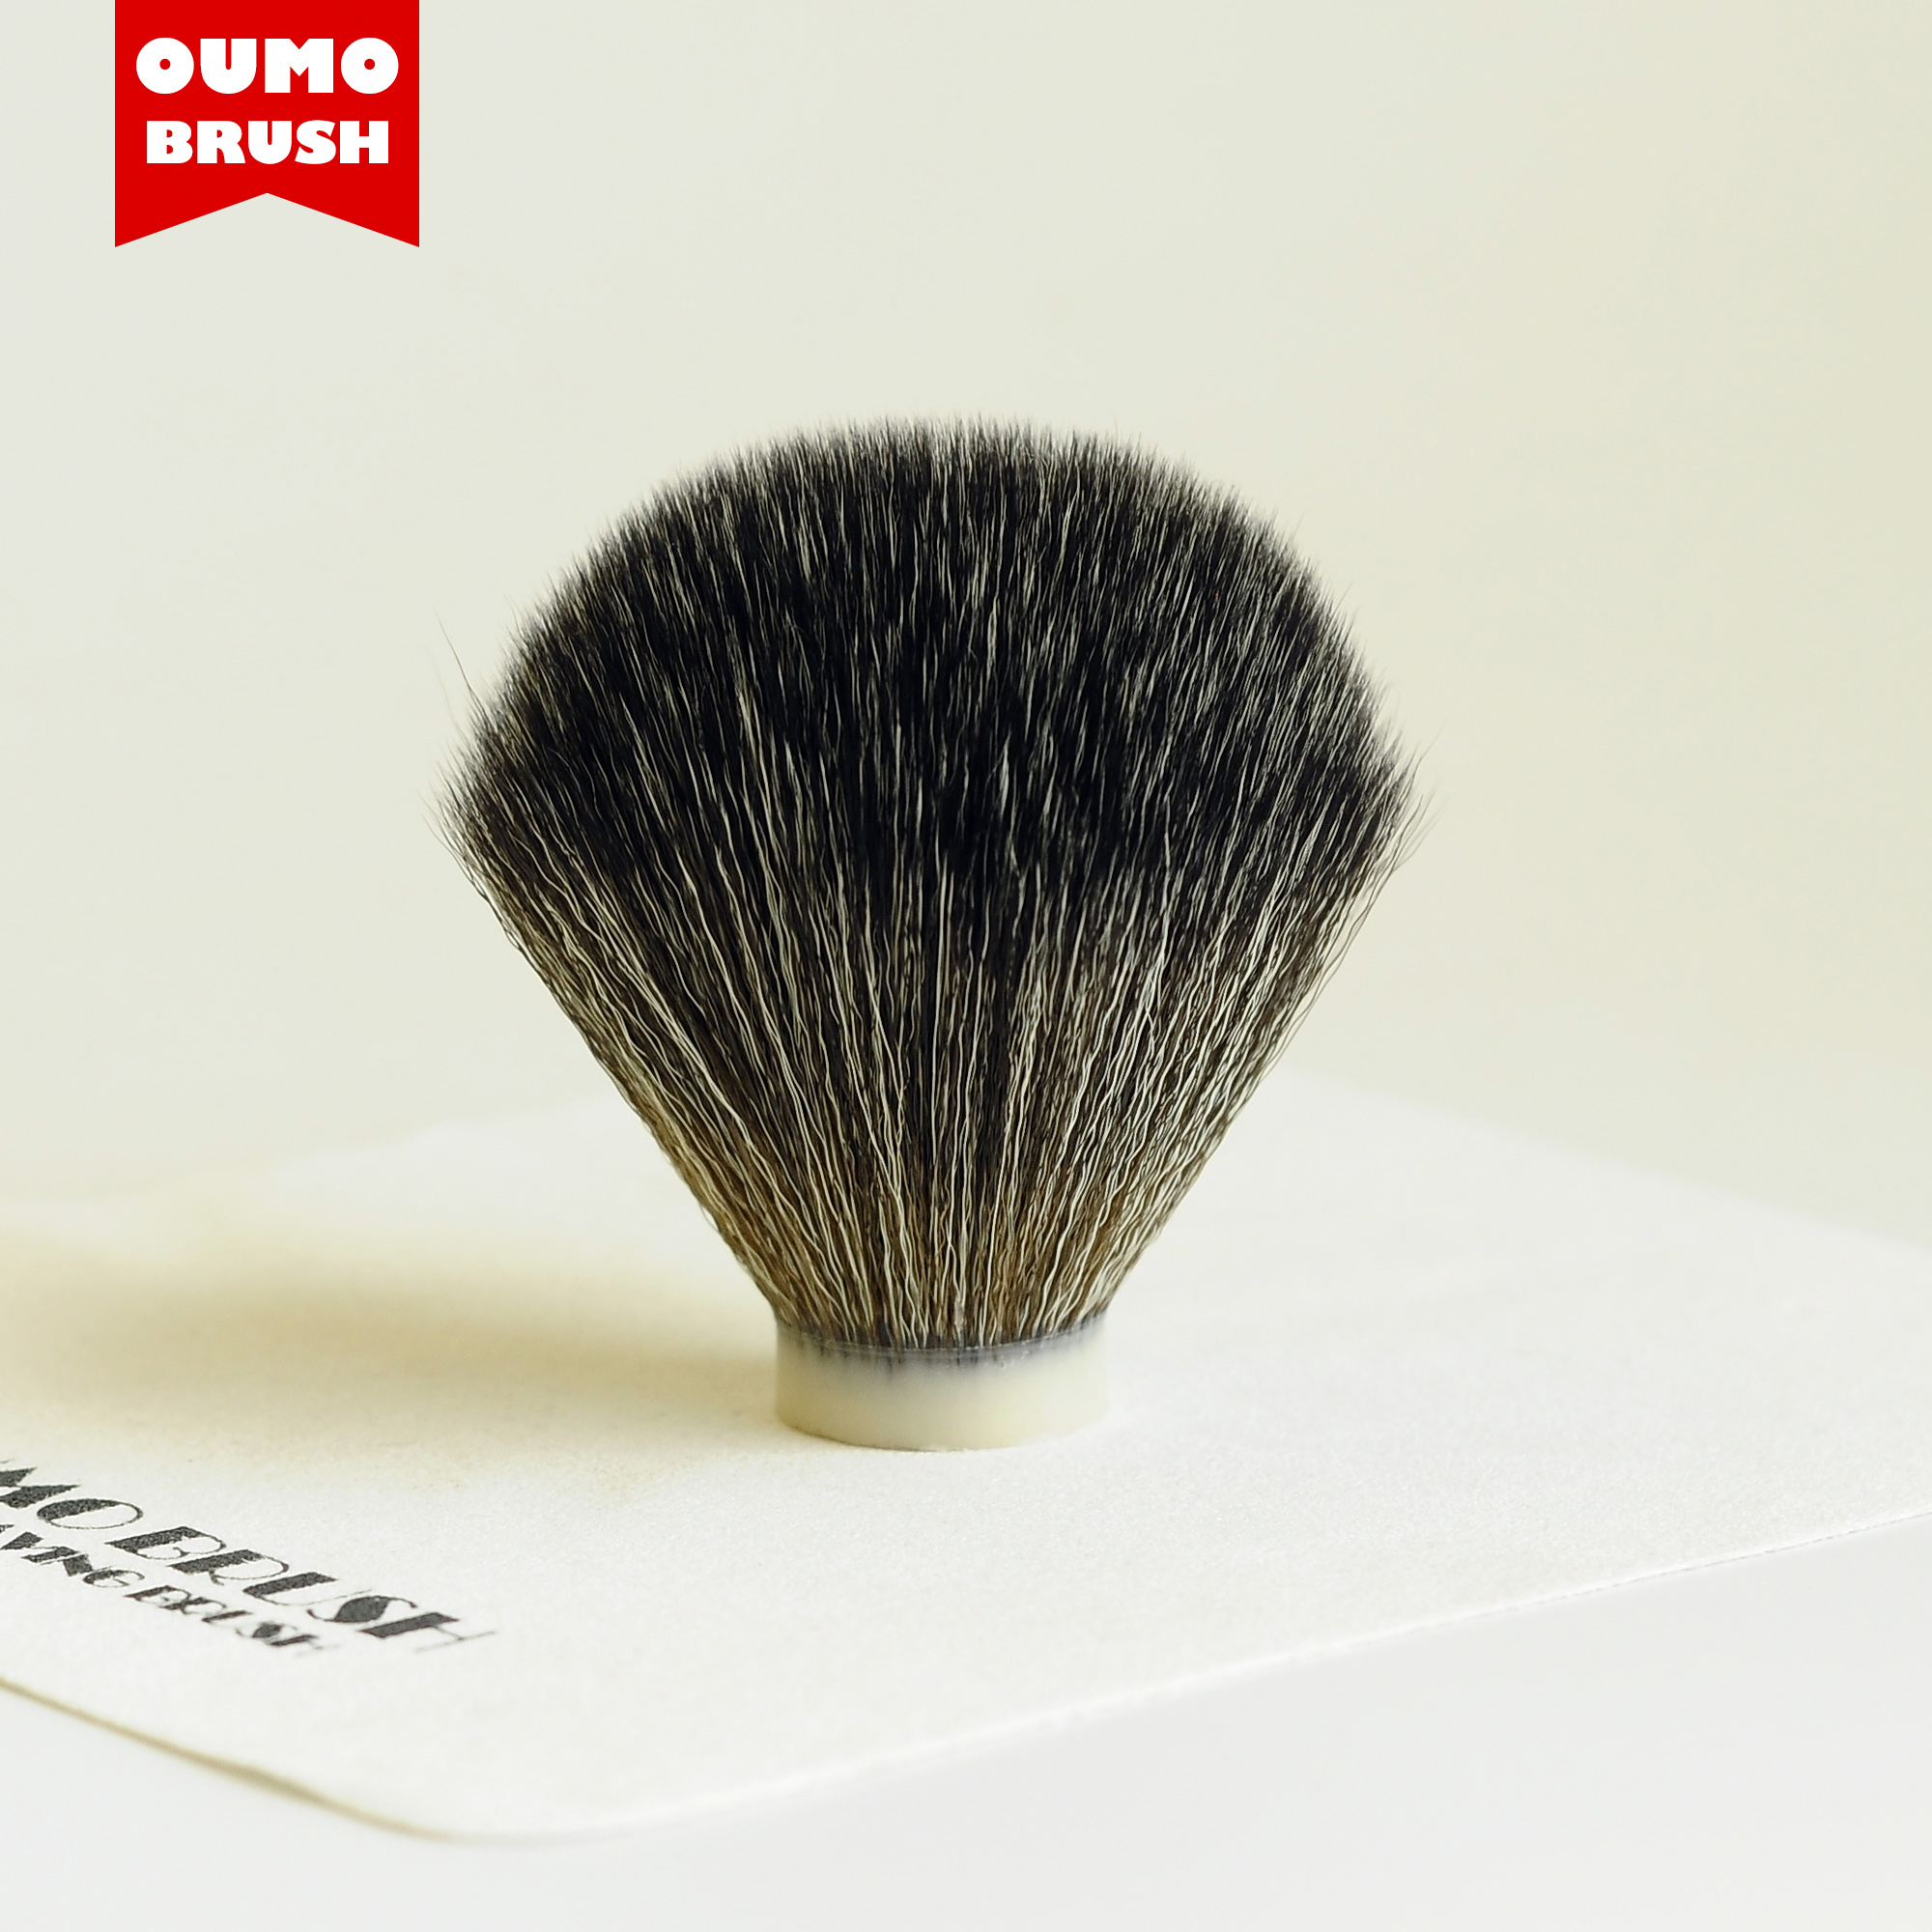 OUMO BRUSH- Imitate Mix Badger Knot  Synthetic Hair Knot Shaving Brush Knots